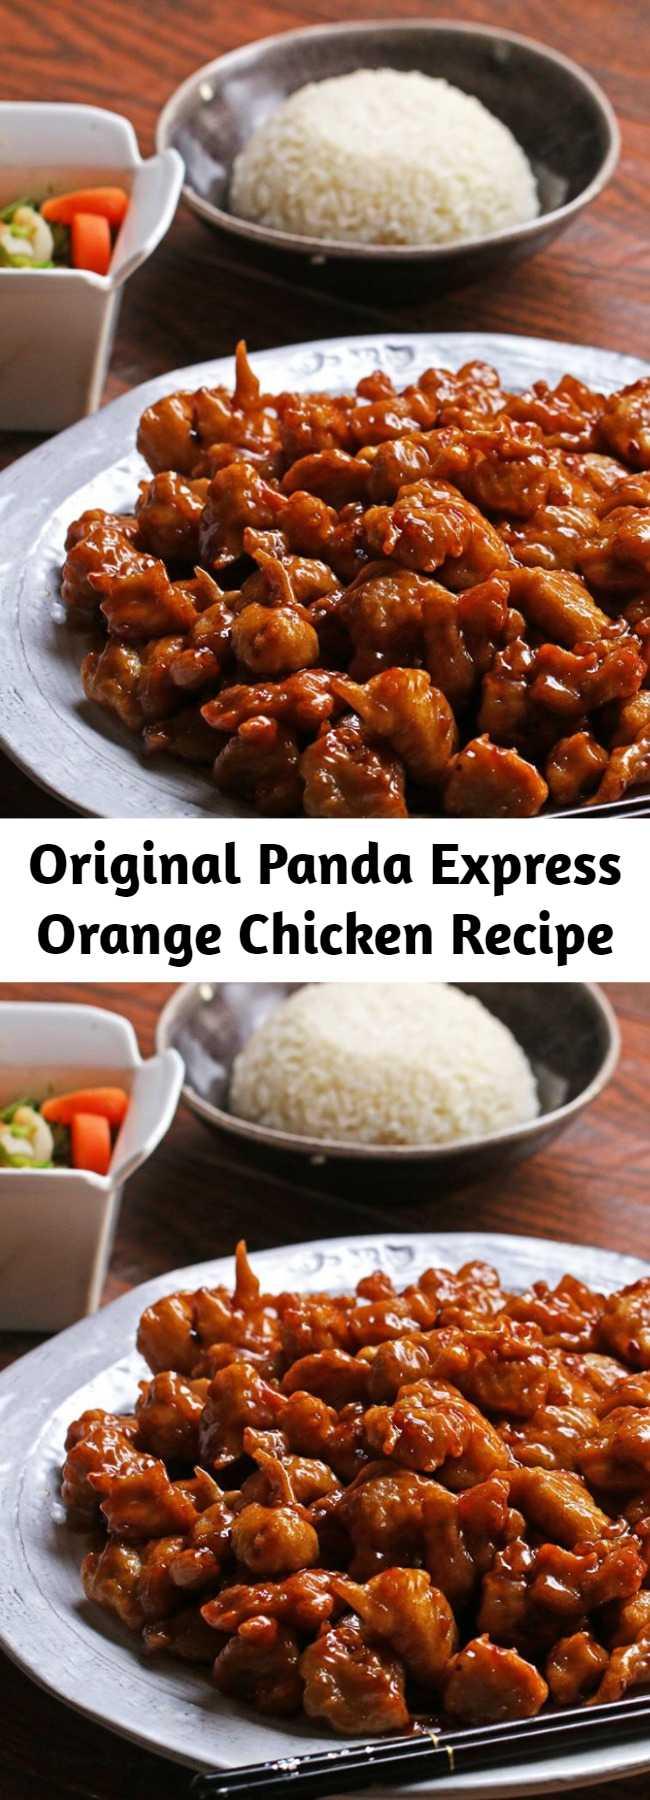 Original Panda Express Orange Chicken Recipe - The Original Orange Chicken by Panda Express